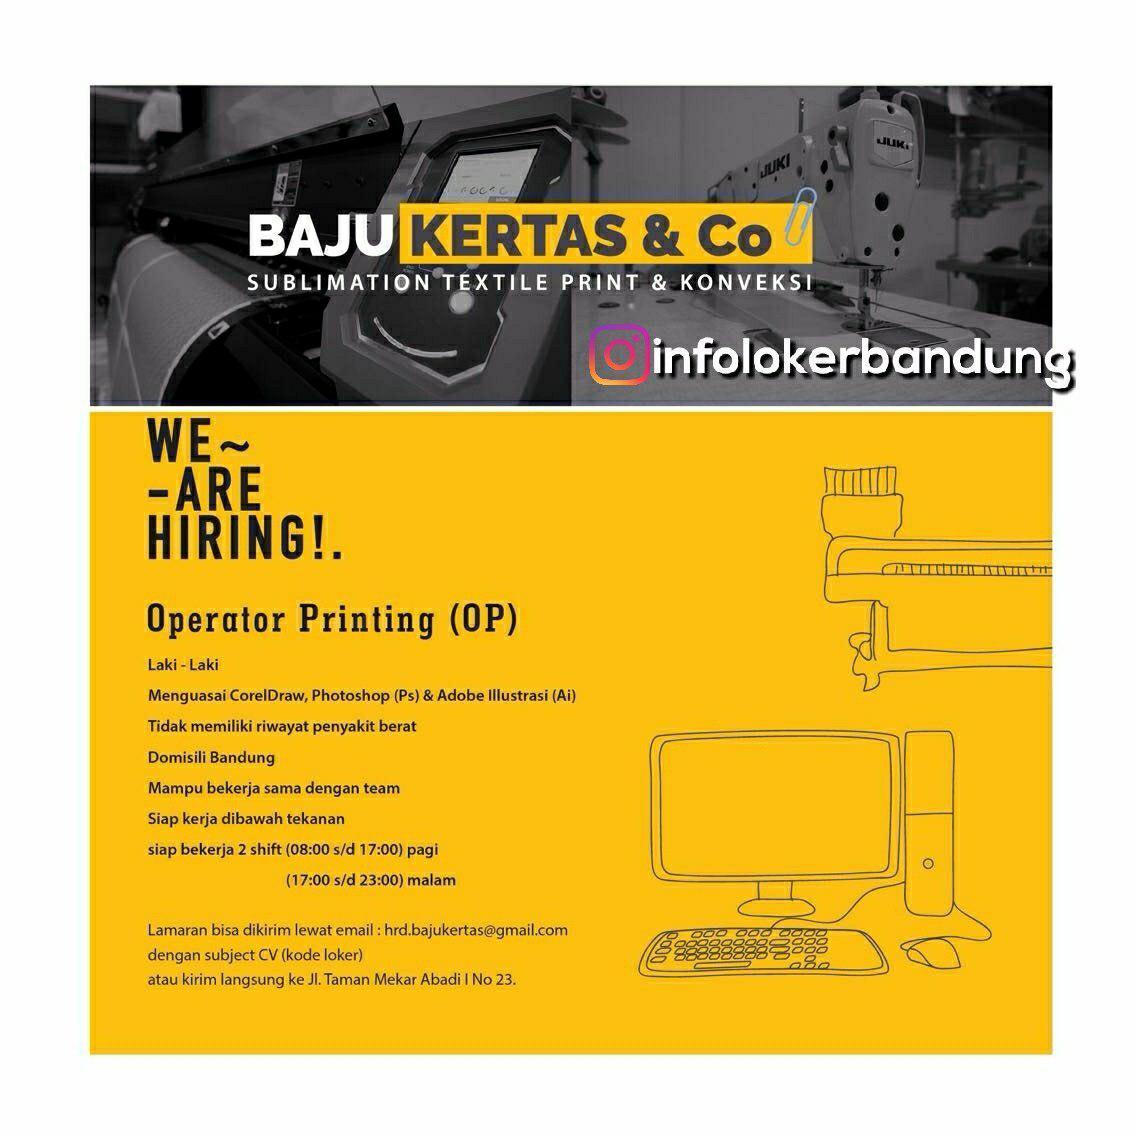 Lowongan Kerja Baju Kertas & Co Bandung Mei 2018